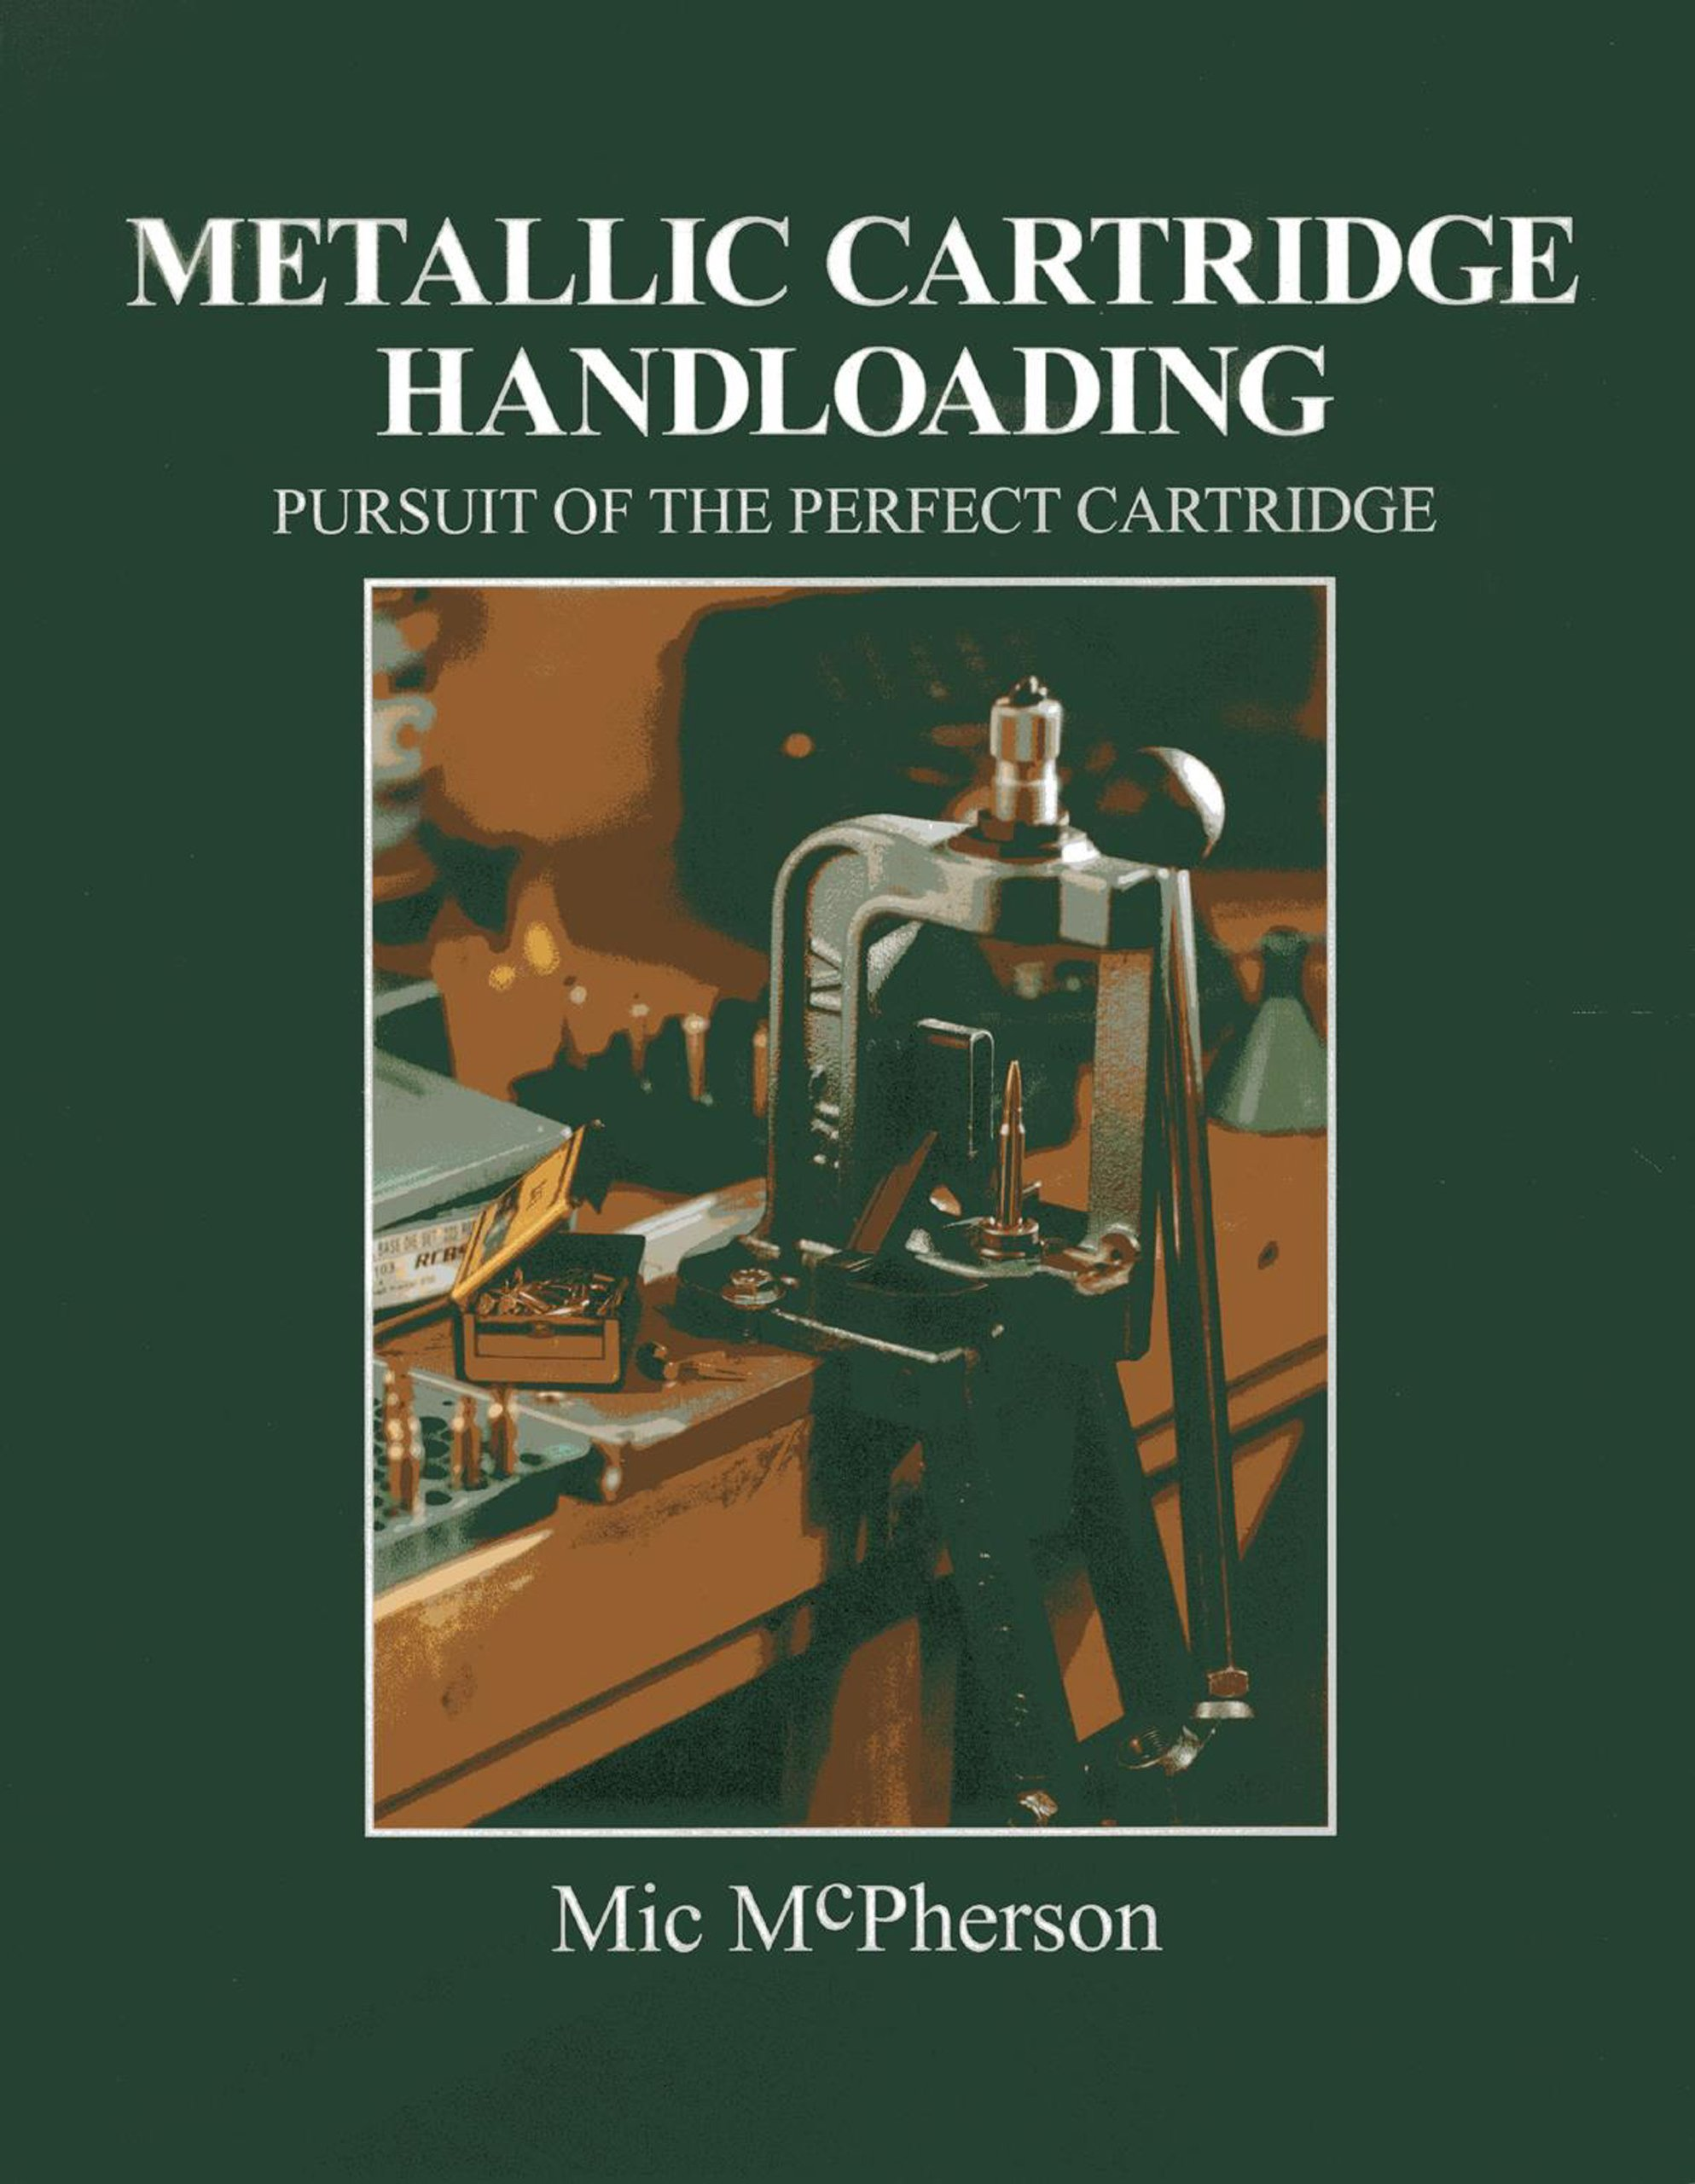 Christmas Books for Shooting and Reloading Aficionados-2